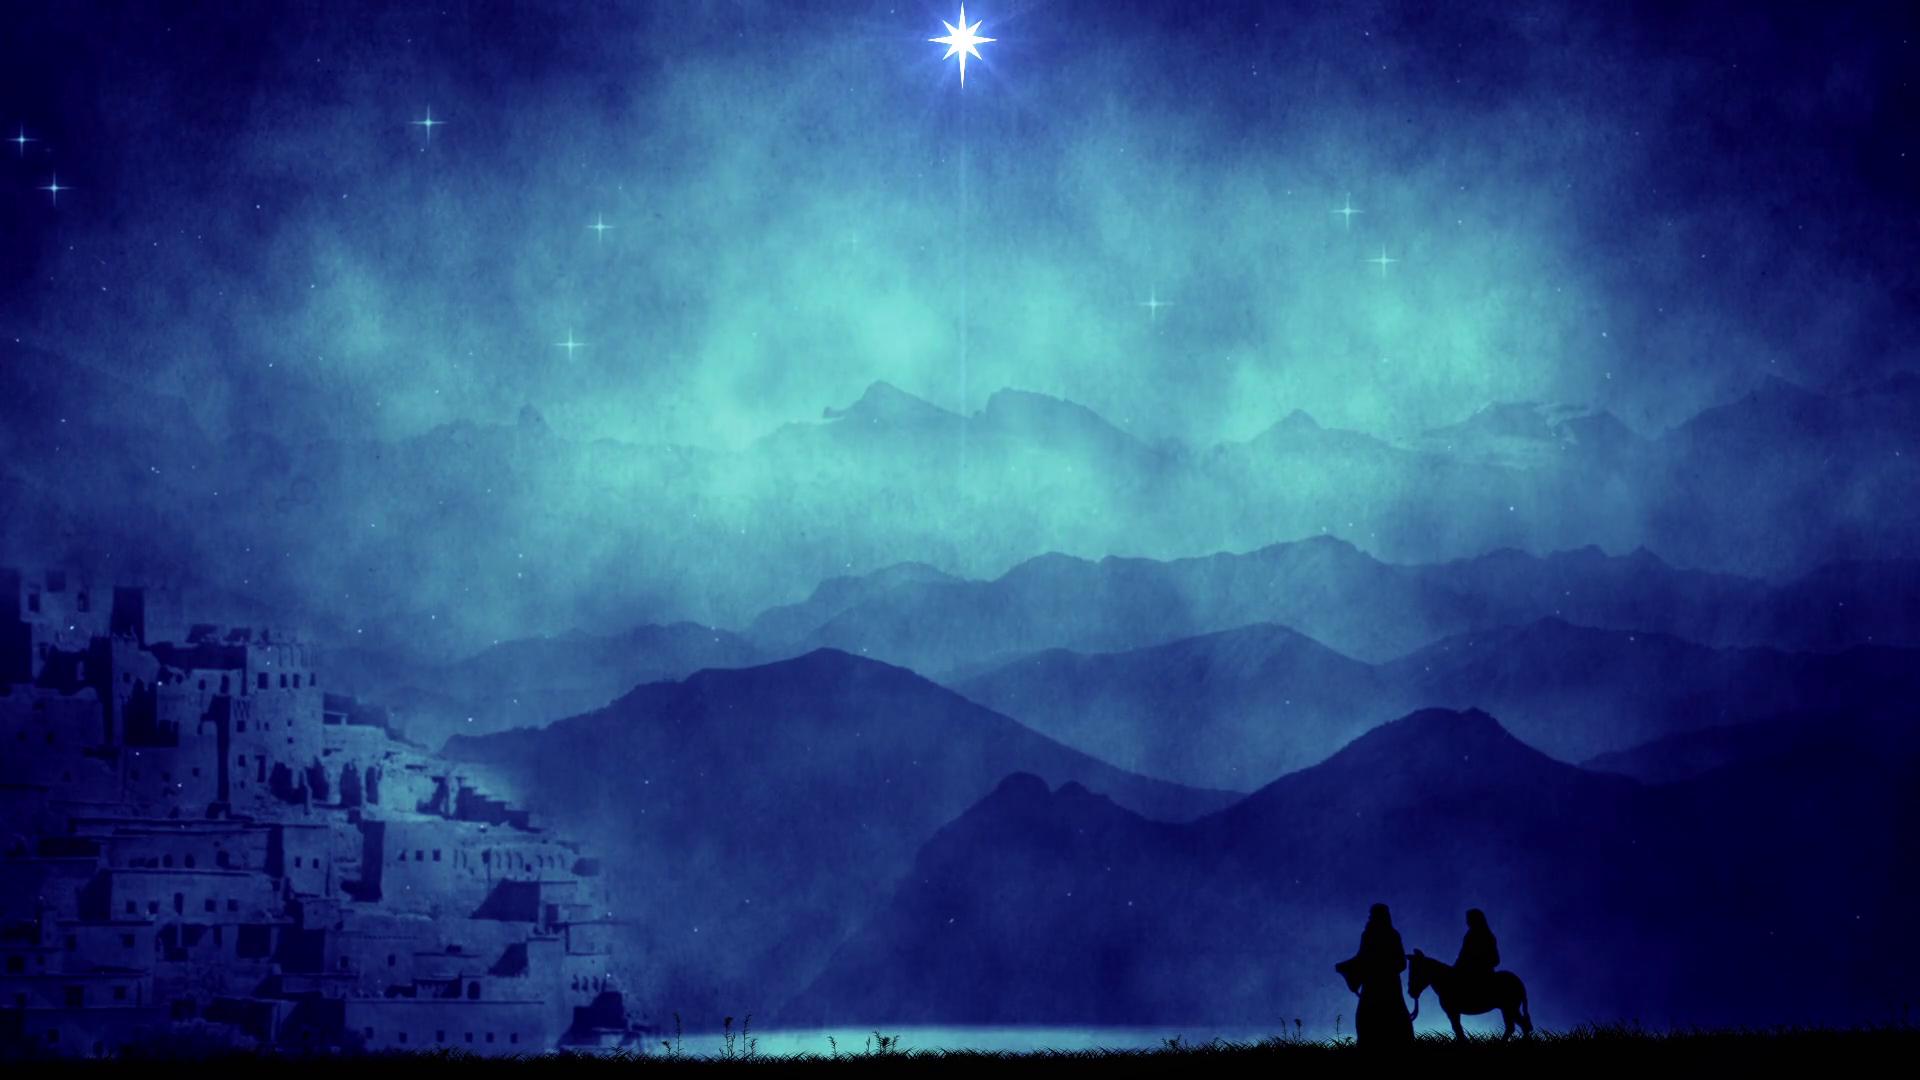 Travelling to Bethlehem